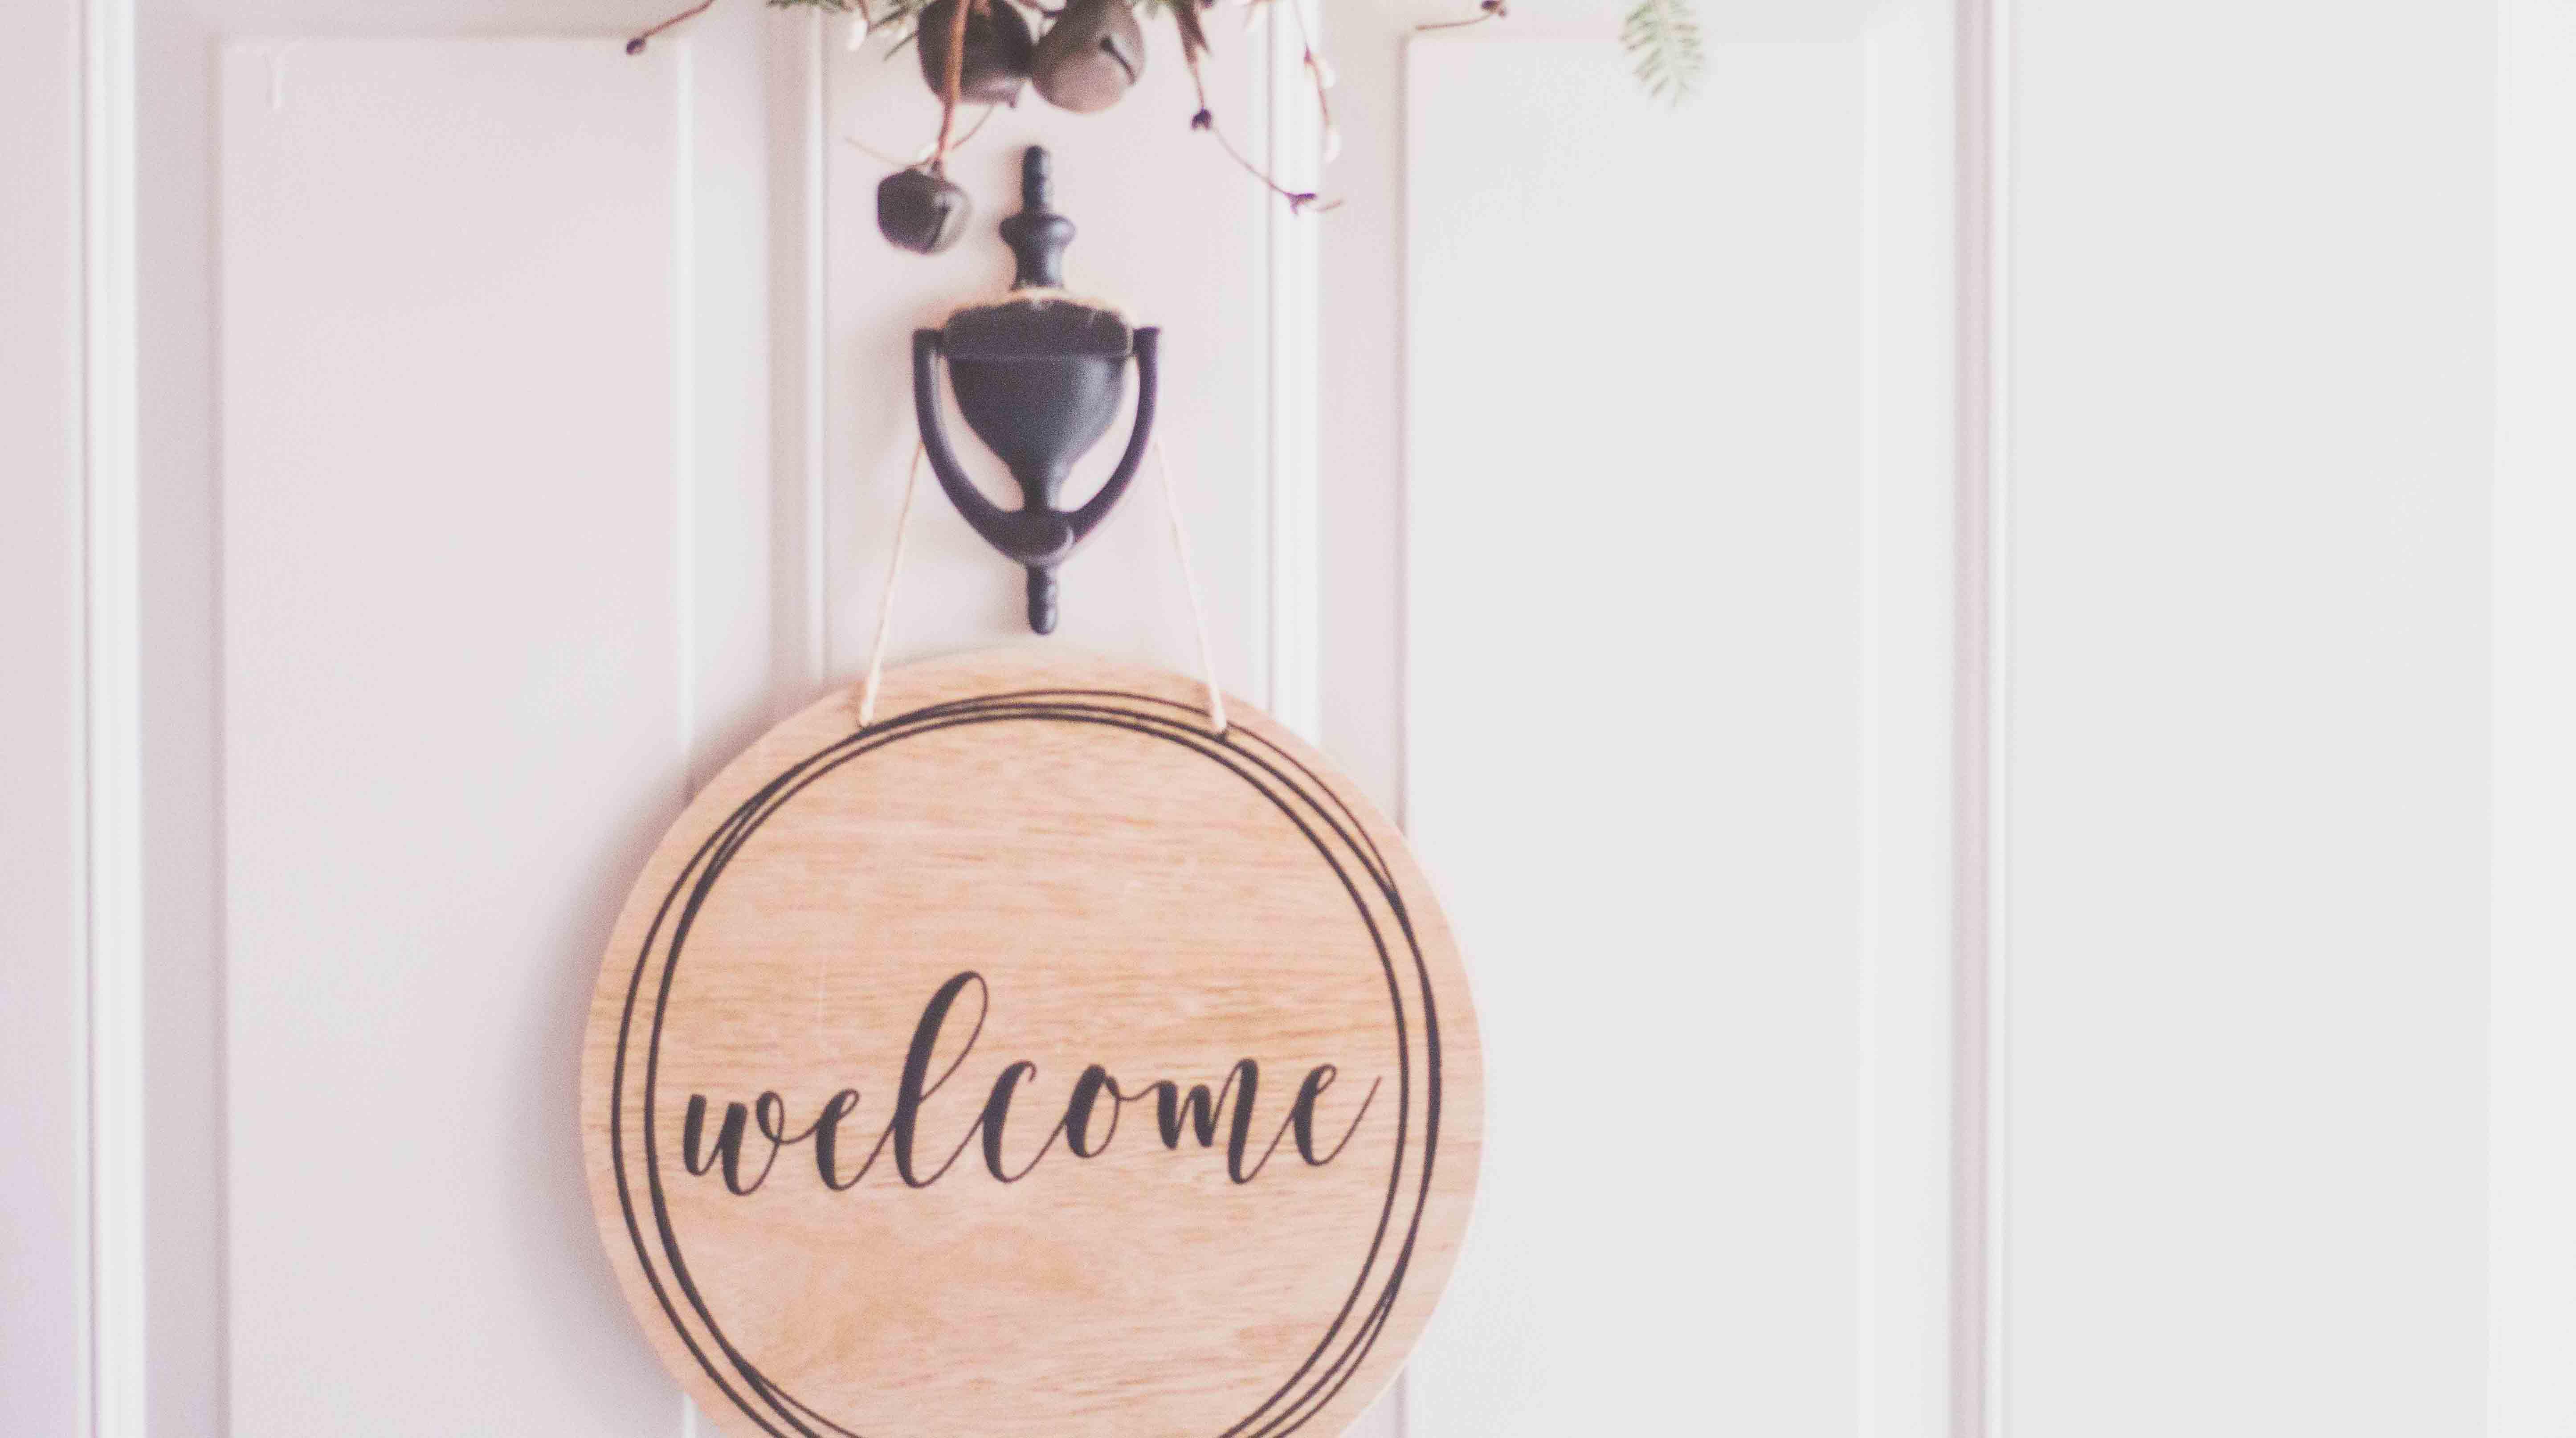 Wooden welcome sign hanging on white door